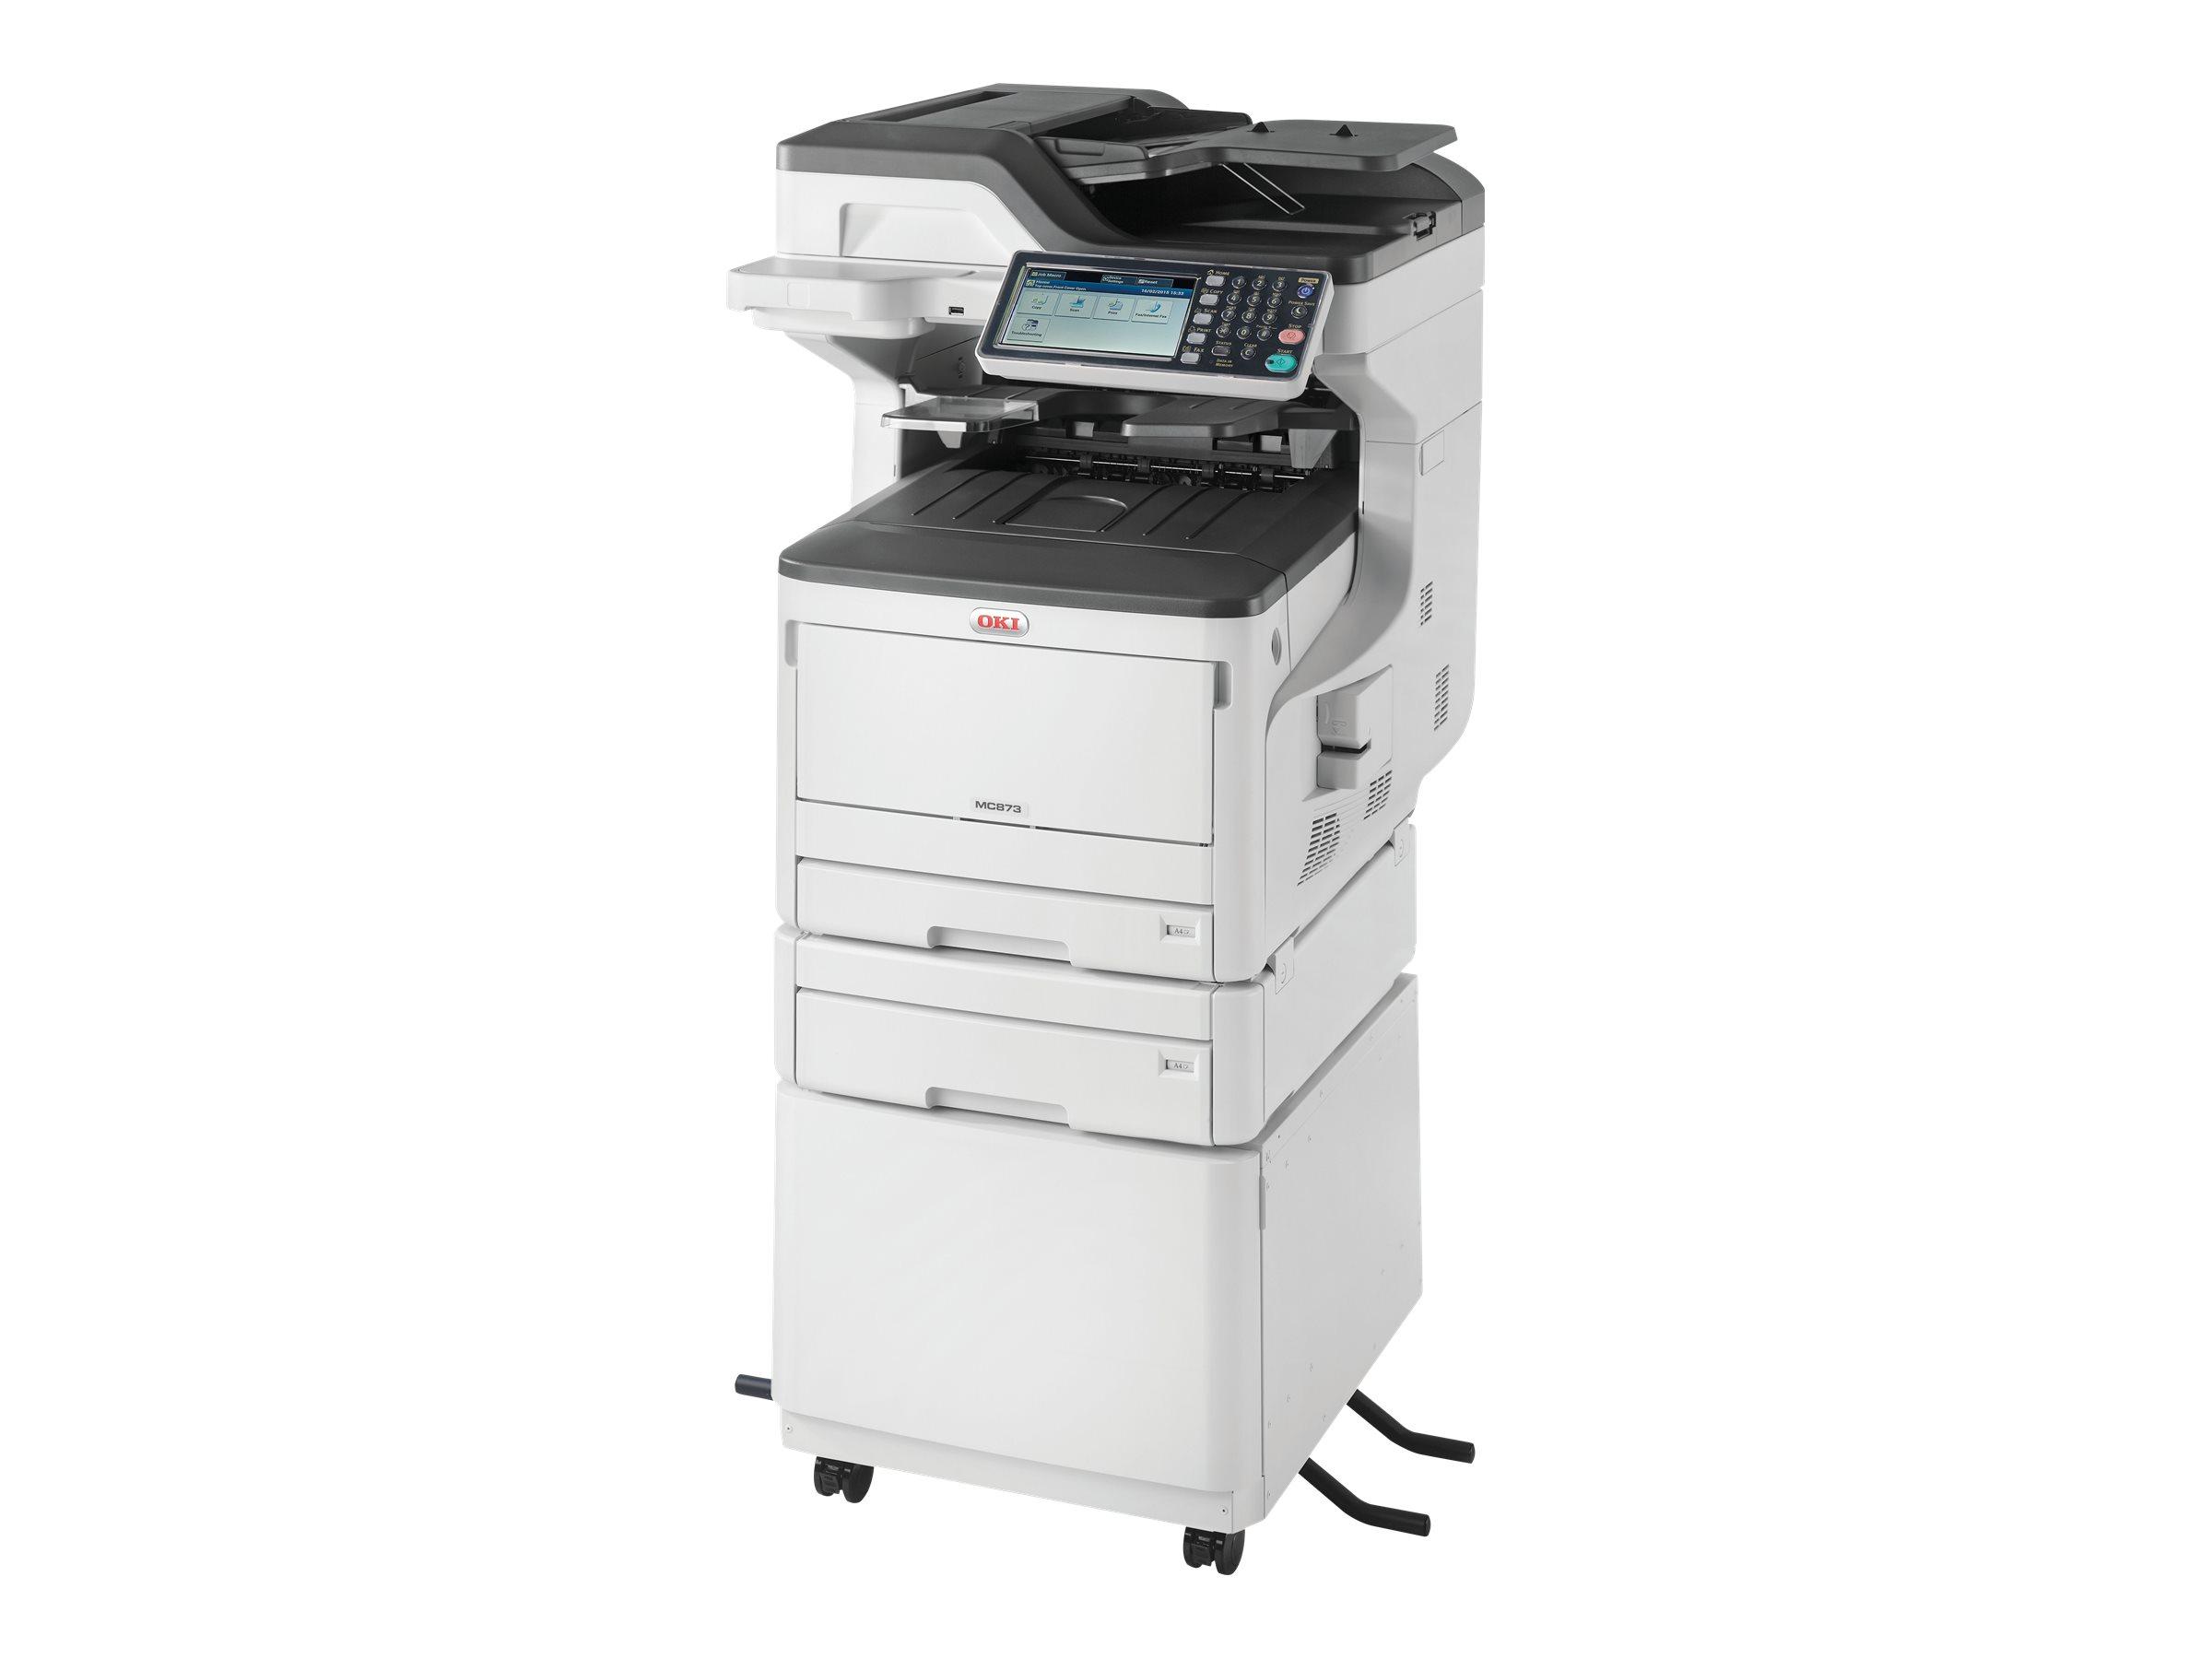 OKI MC873DNCT - Multifunktionsdrucker - Farbe - LED - 297 x 431.8 mm (Original) - A3 (Medien)